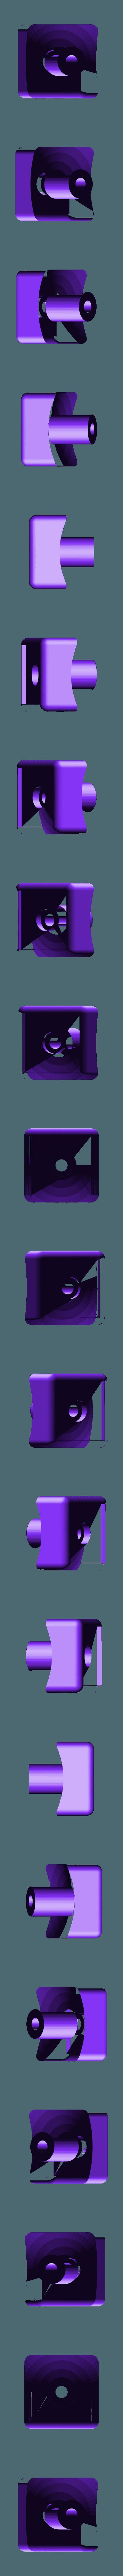 center_remix.stl Download free STL file Rubik's Cube Remixed • 3D printable design, lowboydrvr